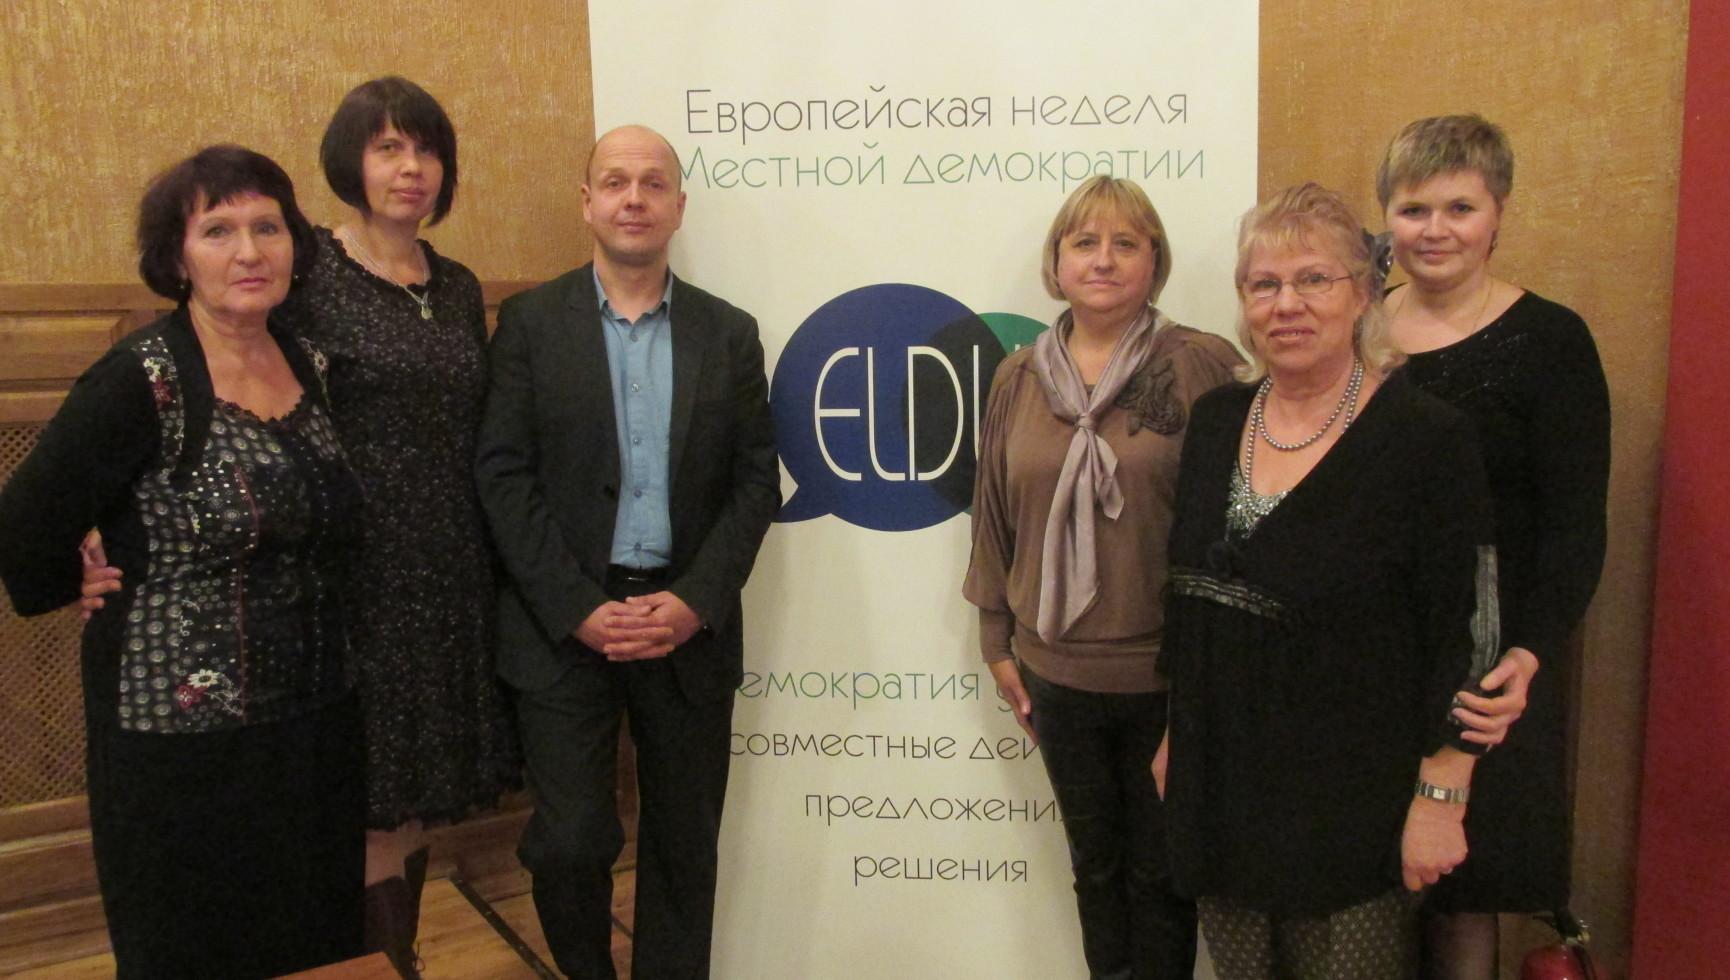 Обучающий семинар в рамках ЕНМД